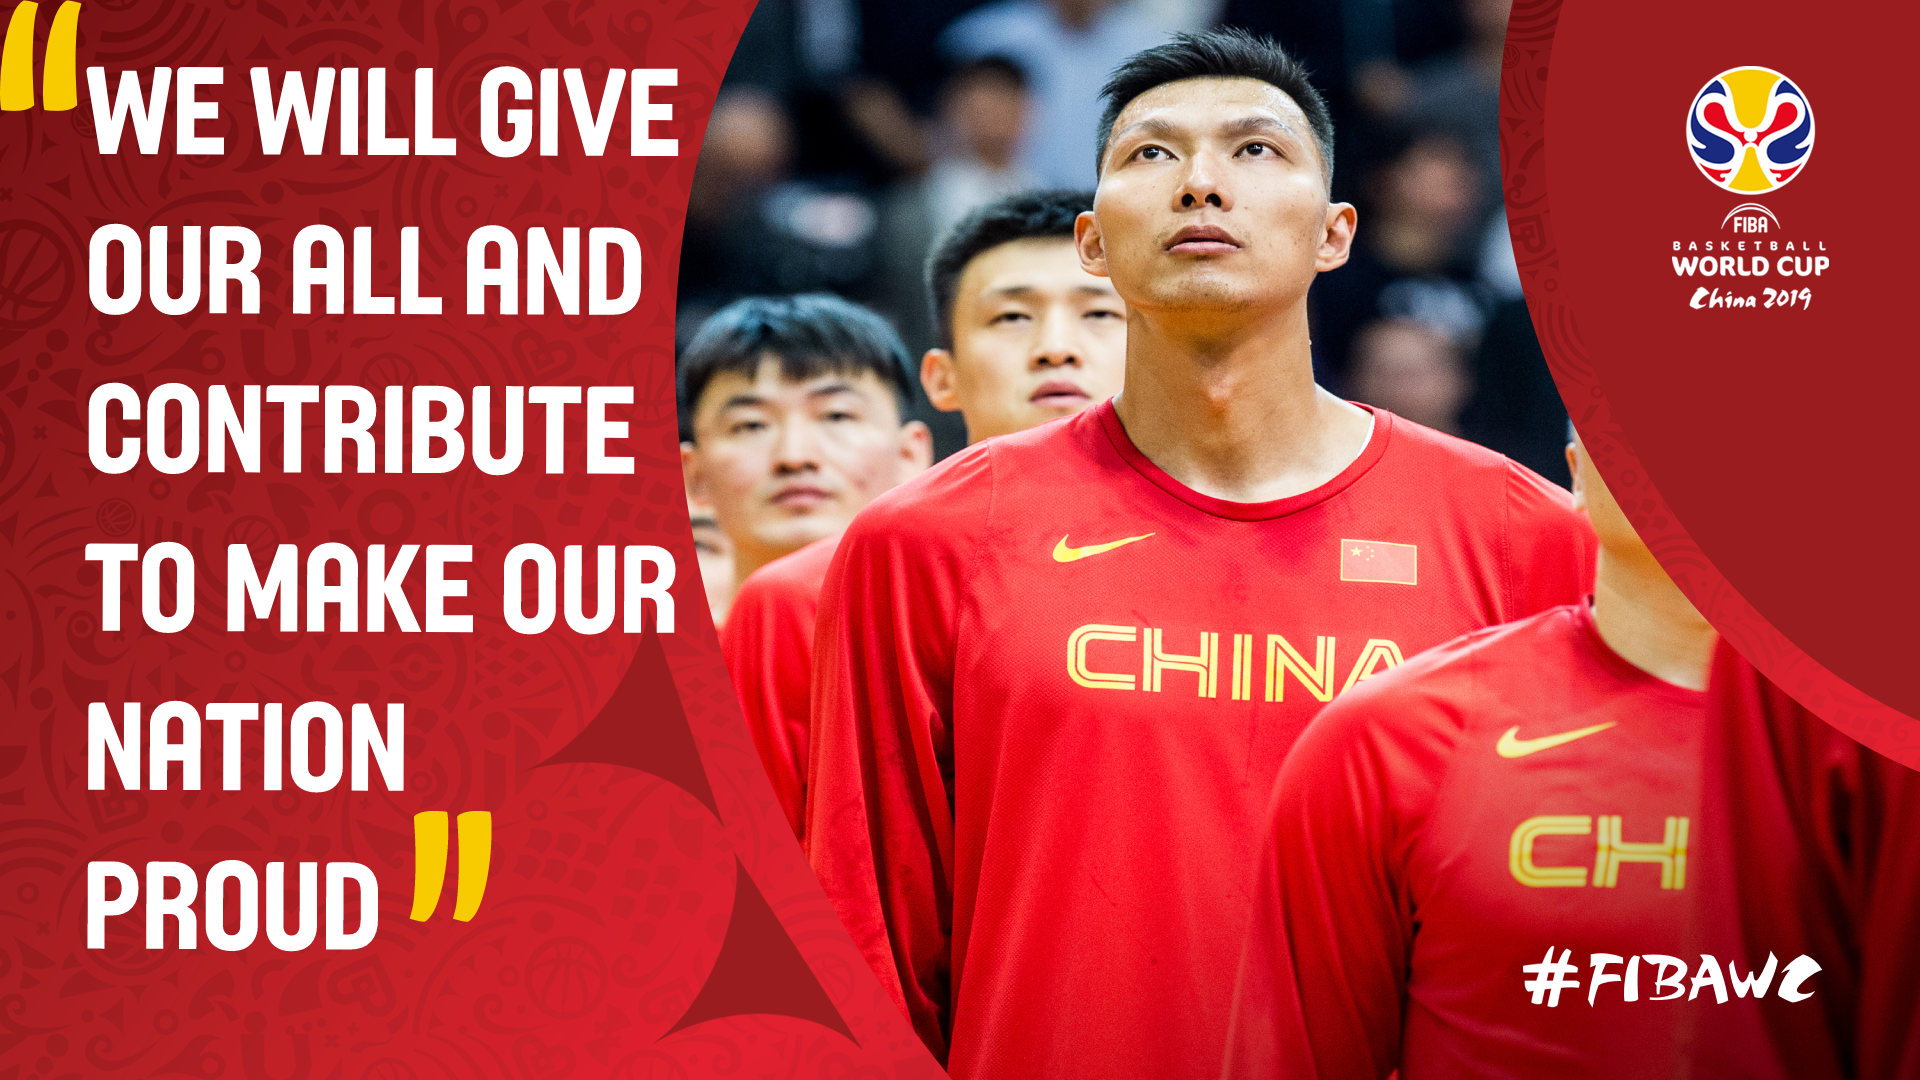 FIBAWC Preview: Chinese Homeland heroes reaching beyond borders